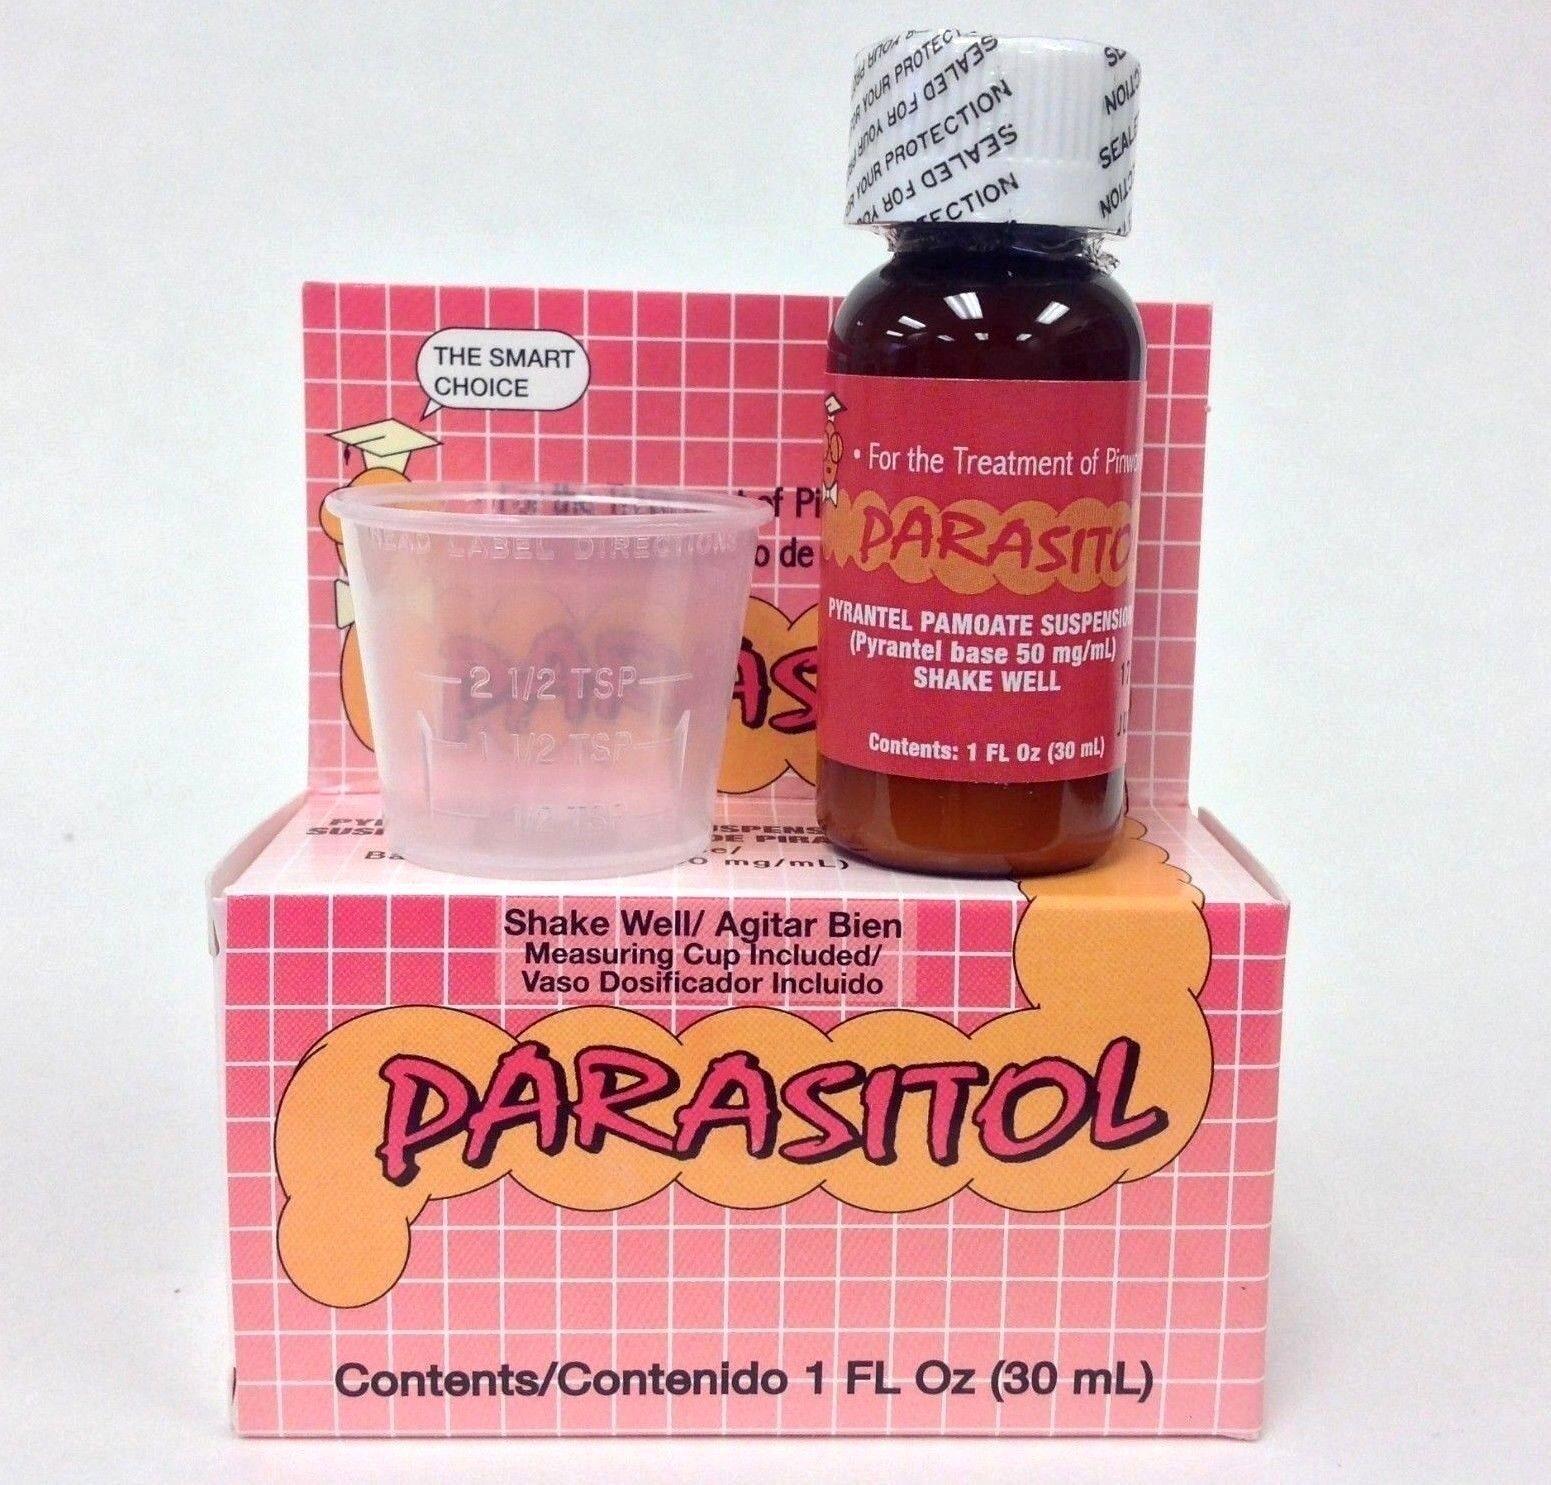 2 PARASITOL 1 oz REMOVE PARASITE HERBAL - ANTIPARASITE 1